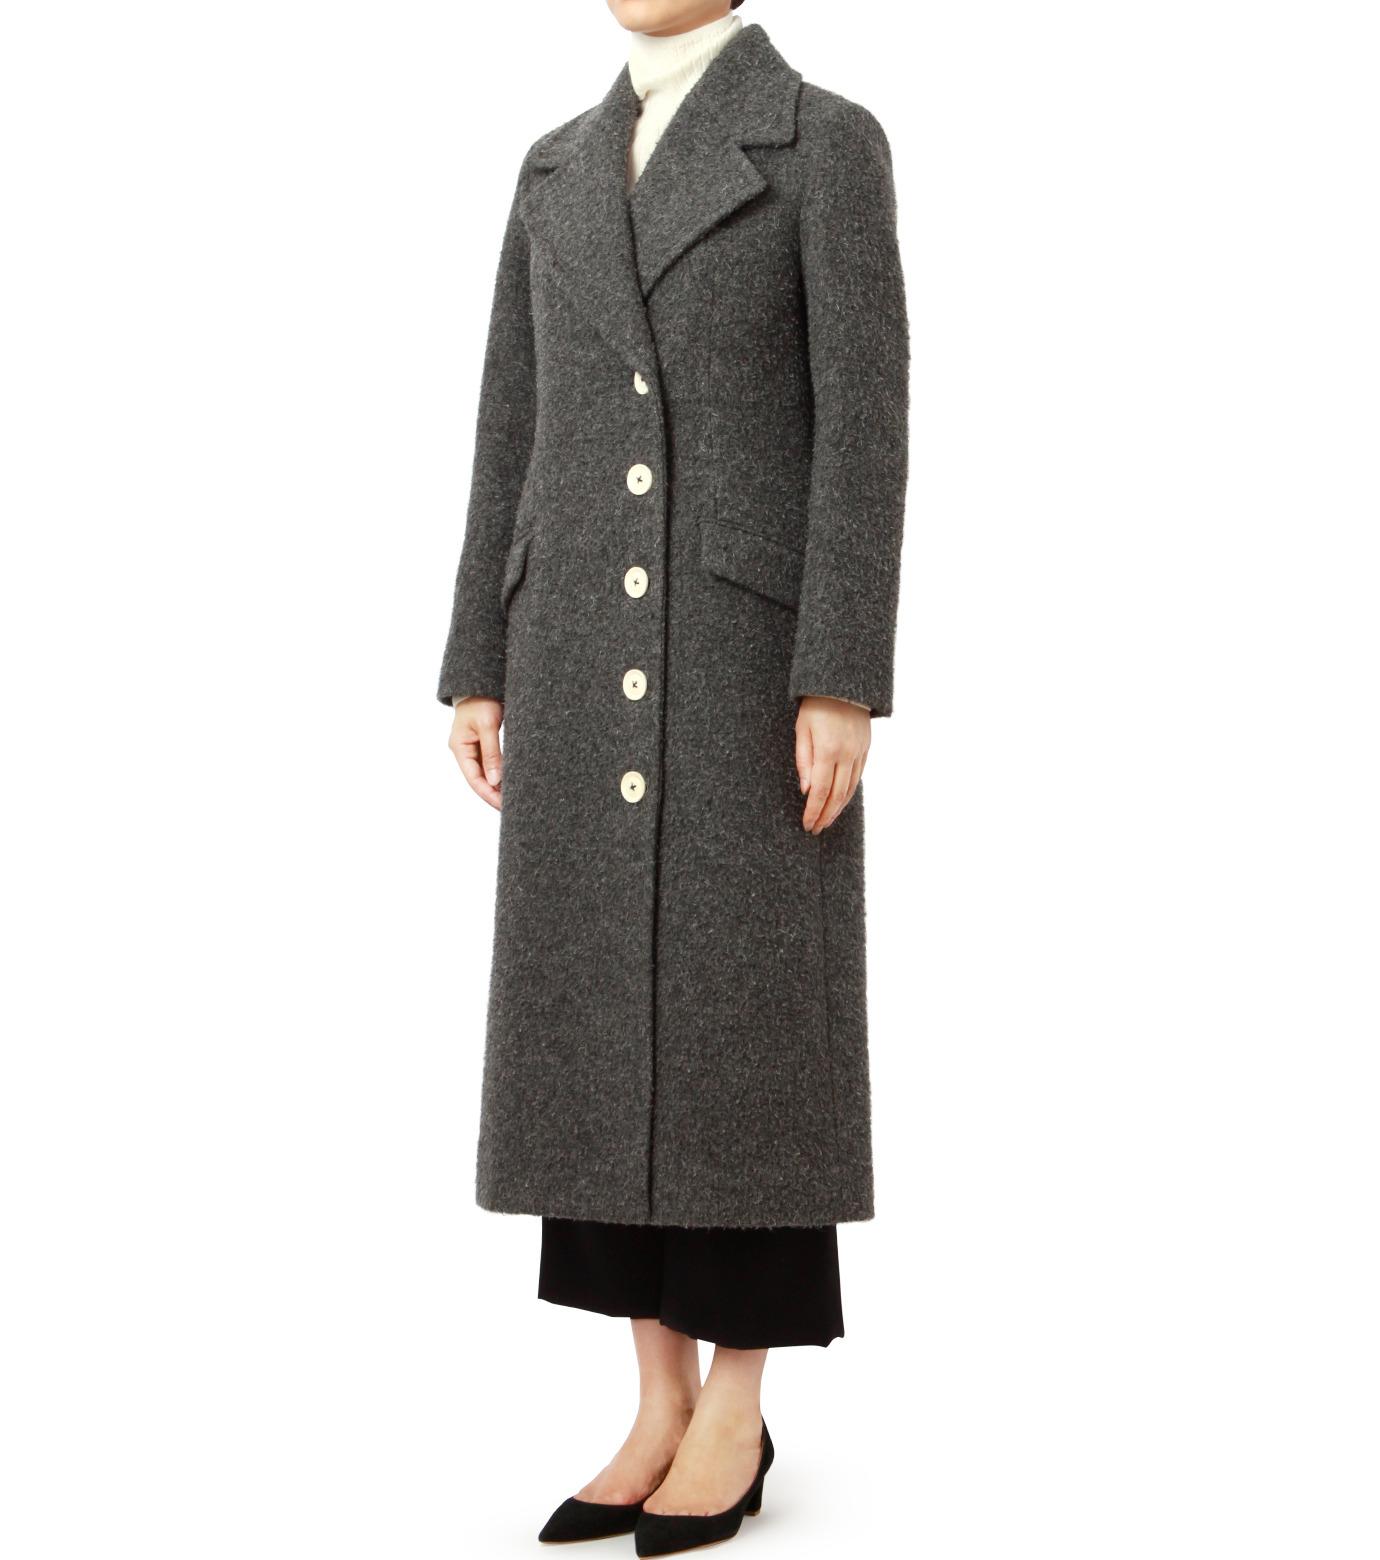 LE CIEL BLEU(ルシェルブルー)のハードナッピングレディシルエットコート-GRAY(コート/coat)-18A69402 拡大詳細画像1